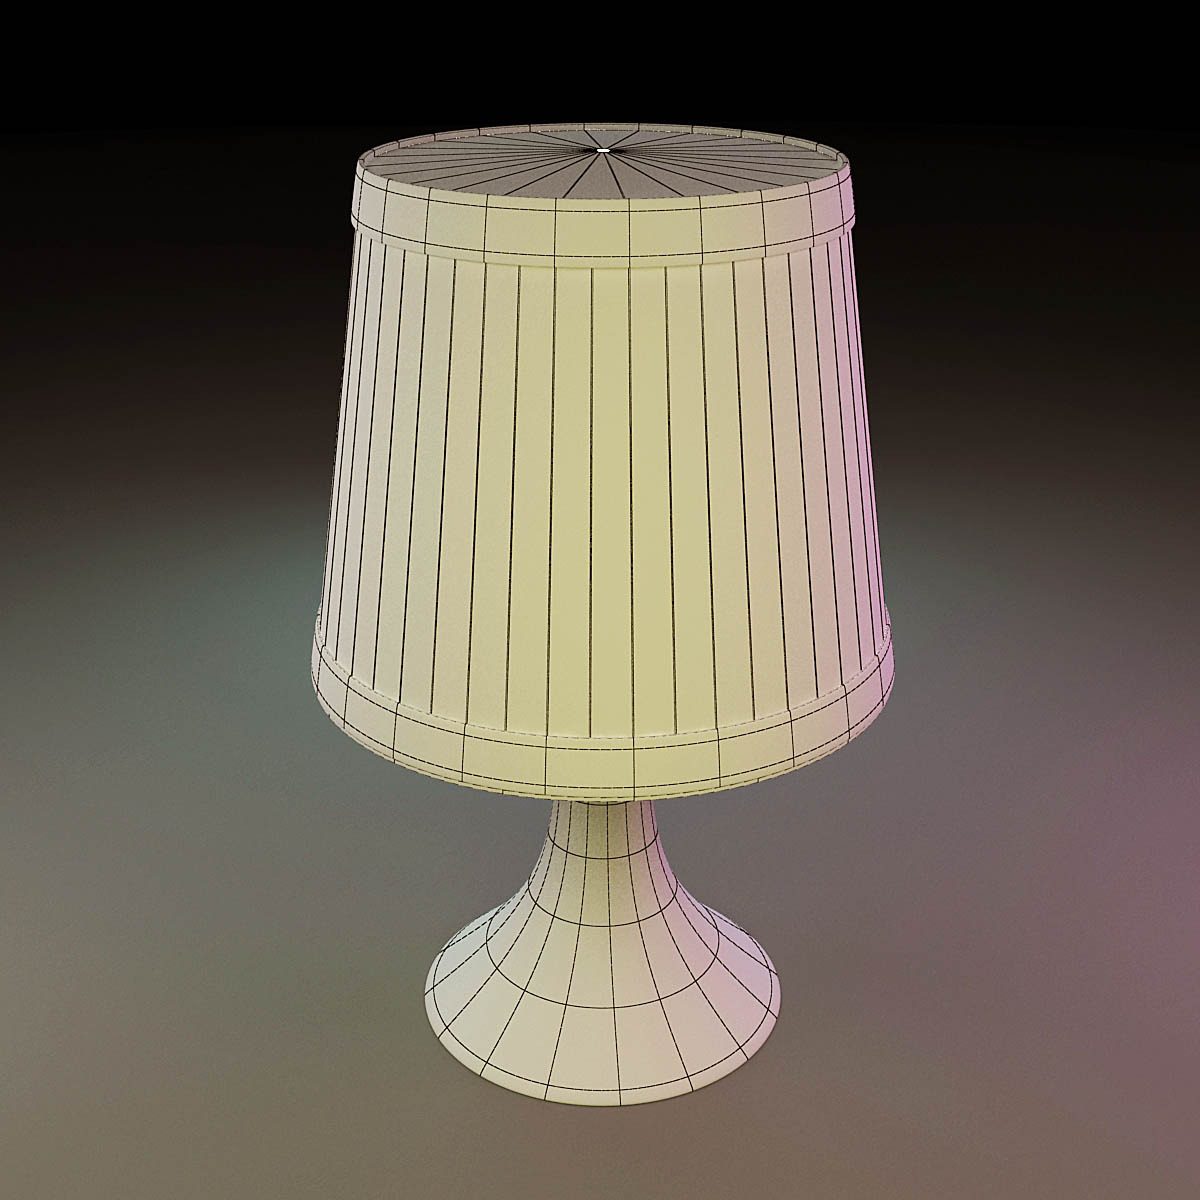 Ikea table lamps 10 in 1 by sercancetin 3docean naturel 2g naturelg stockholm 2g stockholmg vate 2g vateg vidja 2g vidjag geotapseo Image collections